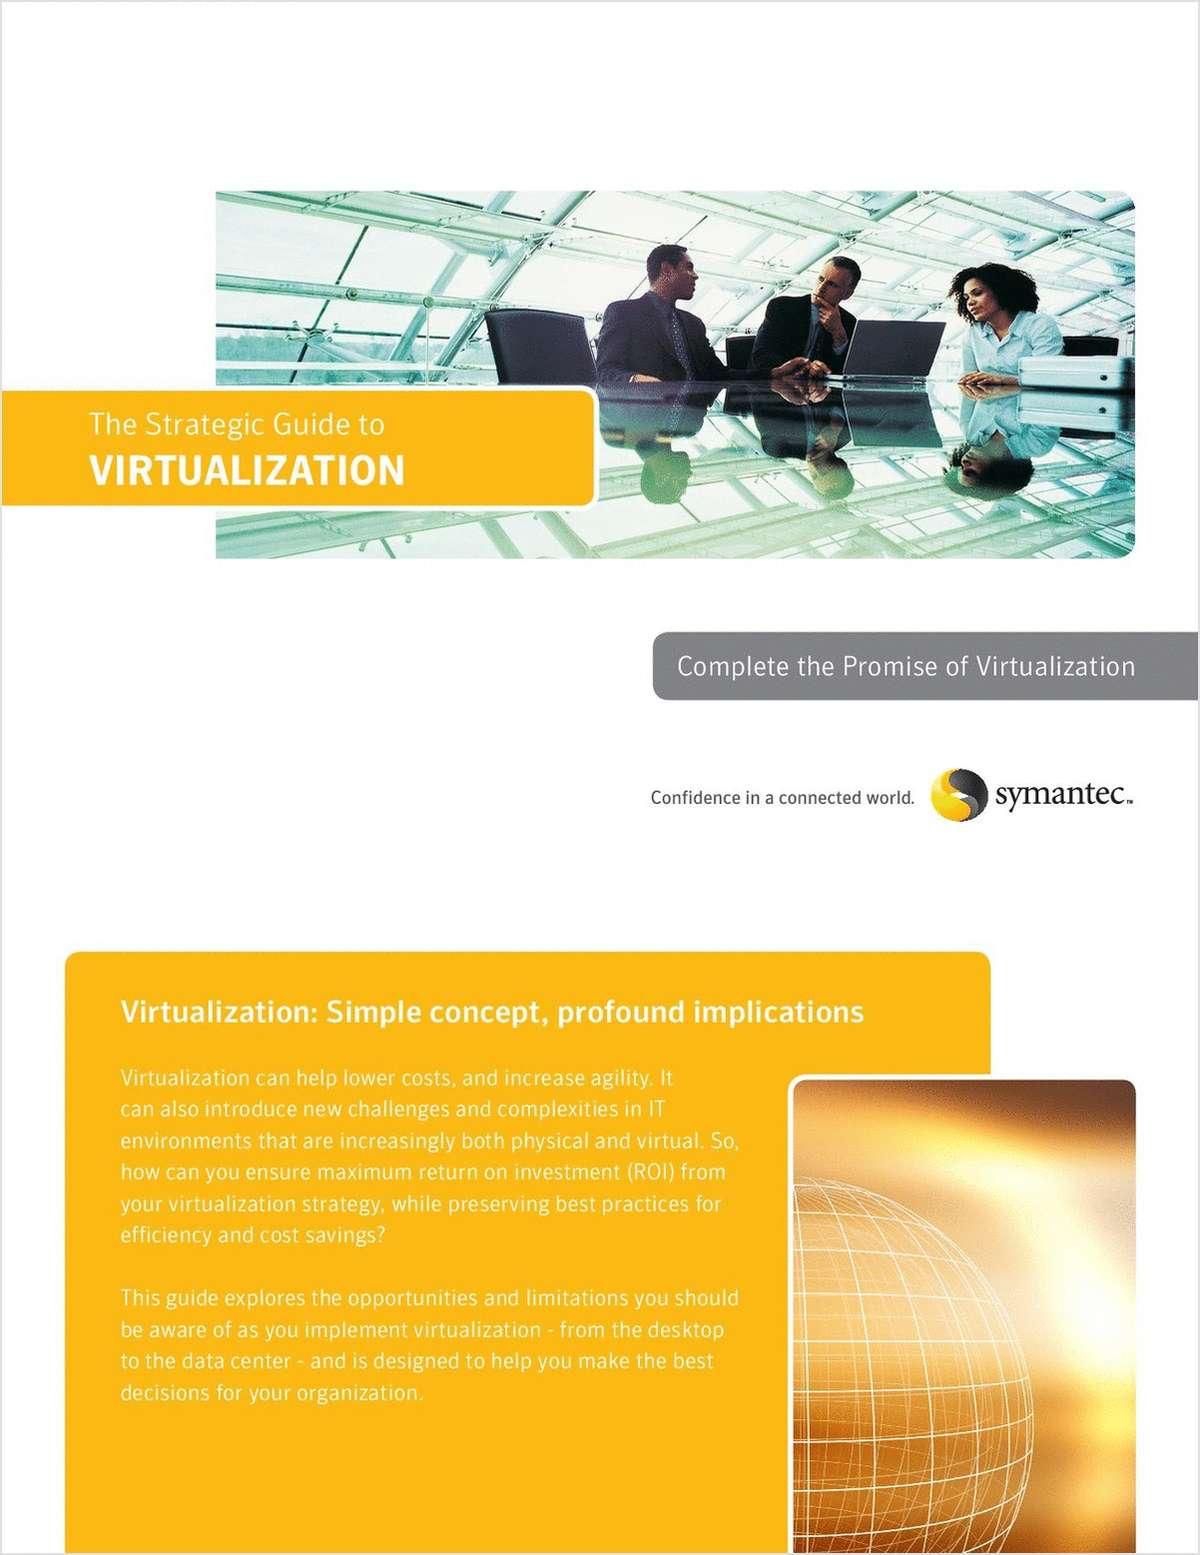 The Strategic Guide to Virtualization